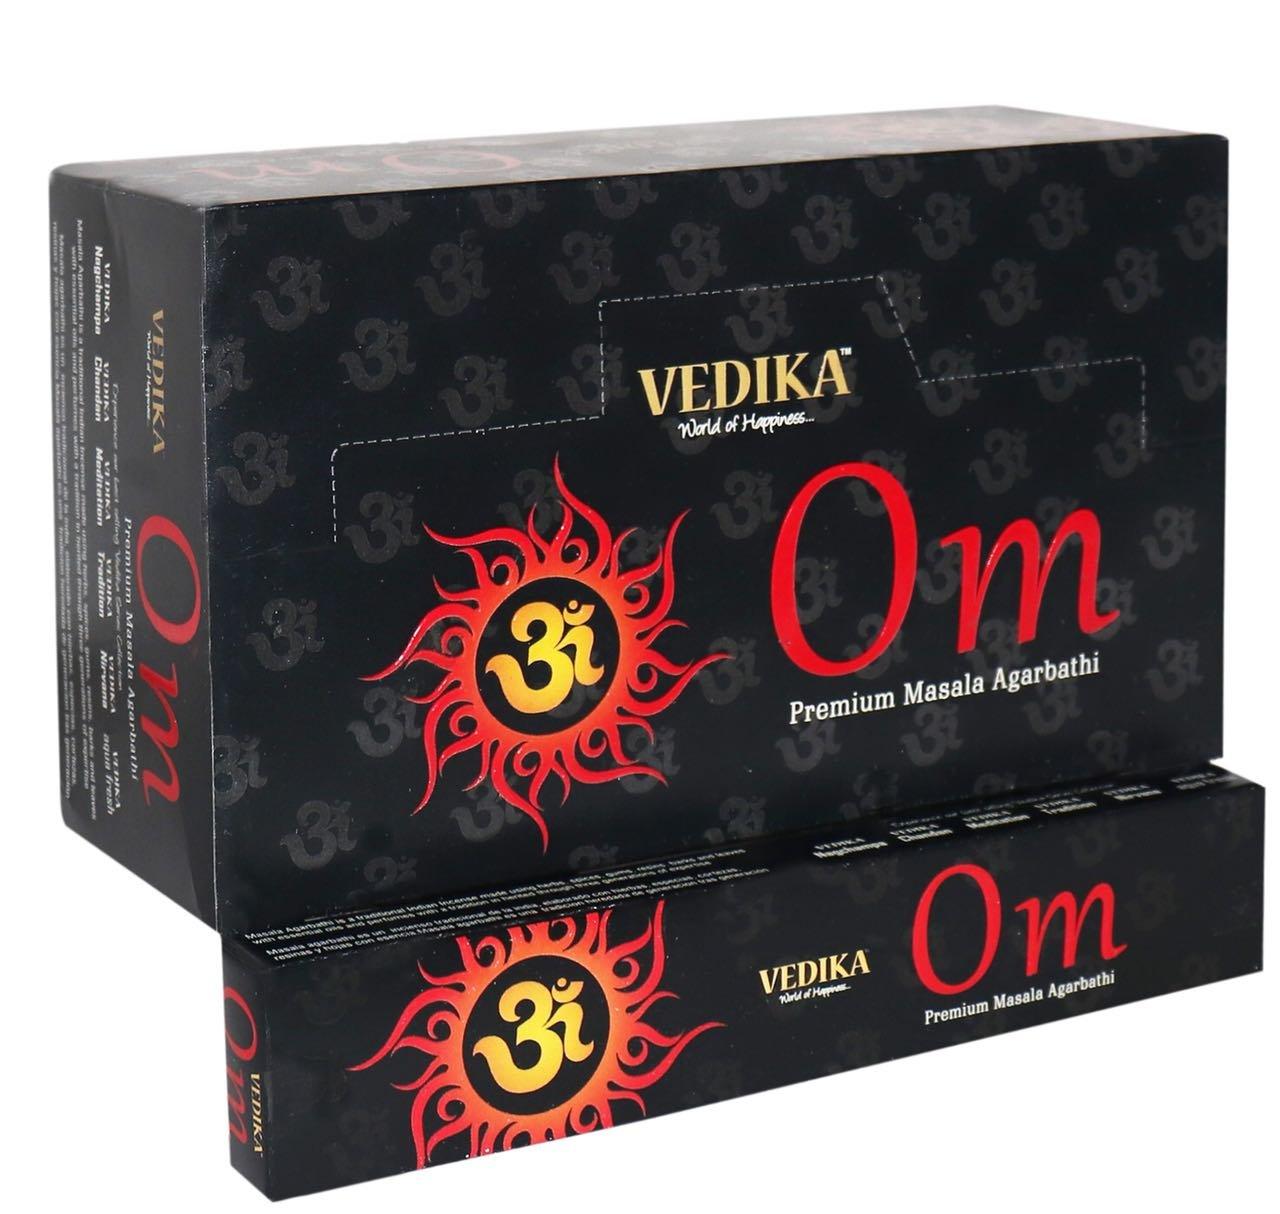 Vedika Om Premium Masala Incense Sticks 15g. x 12 Packets = 180g.